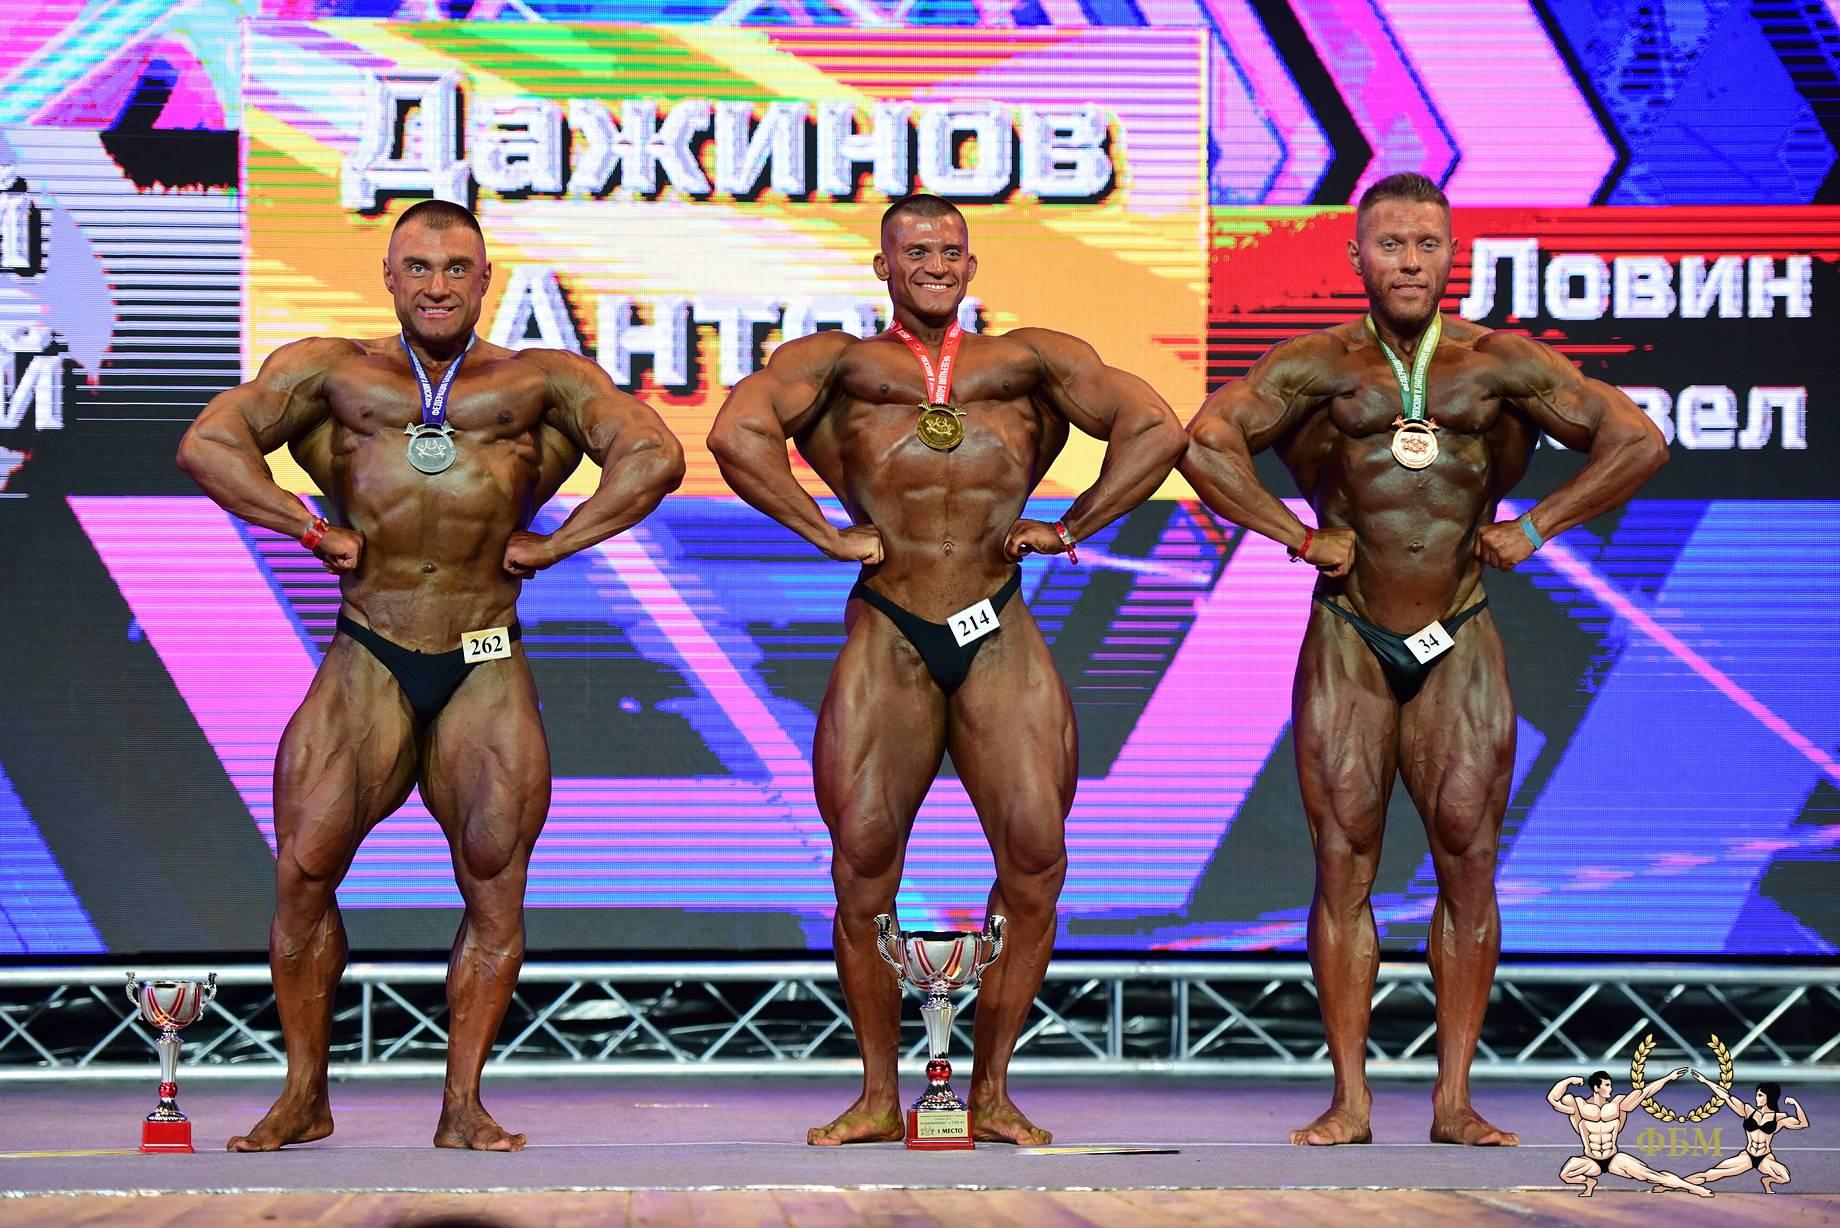 Фото с Чемпионата Москвы 2019 от Никиты Юдина